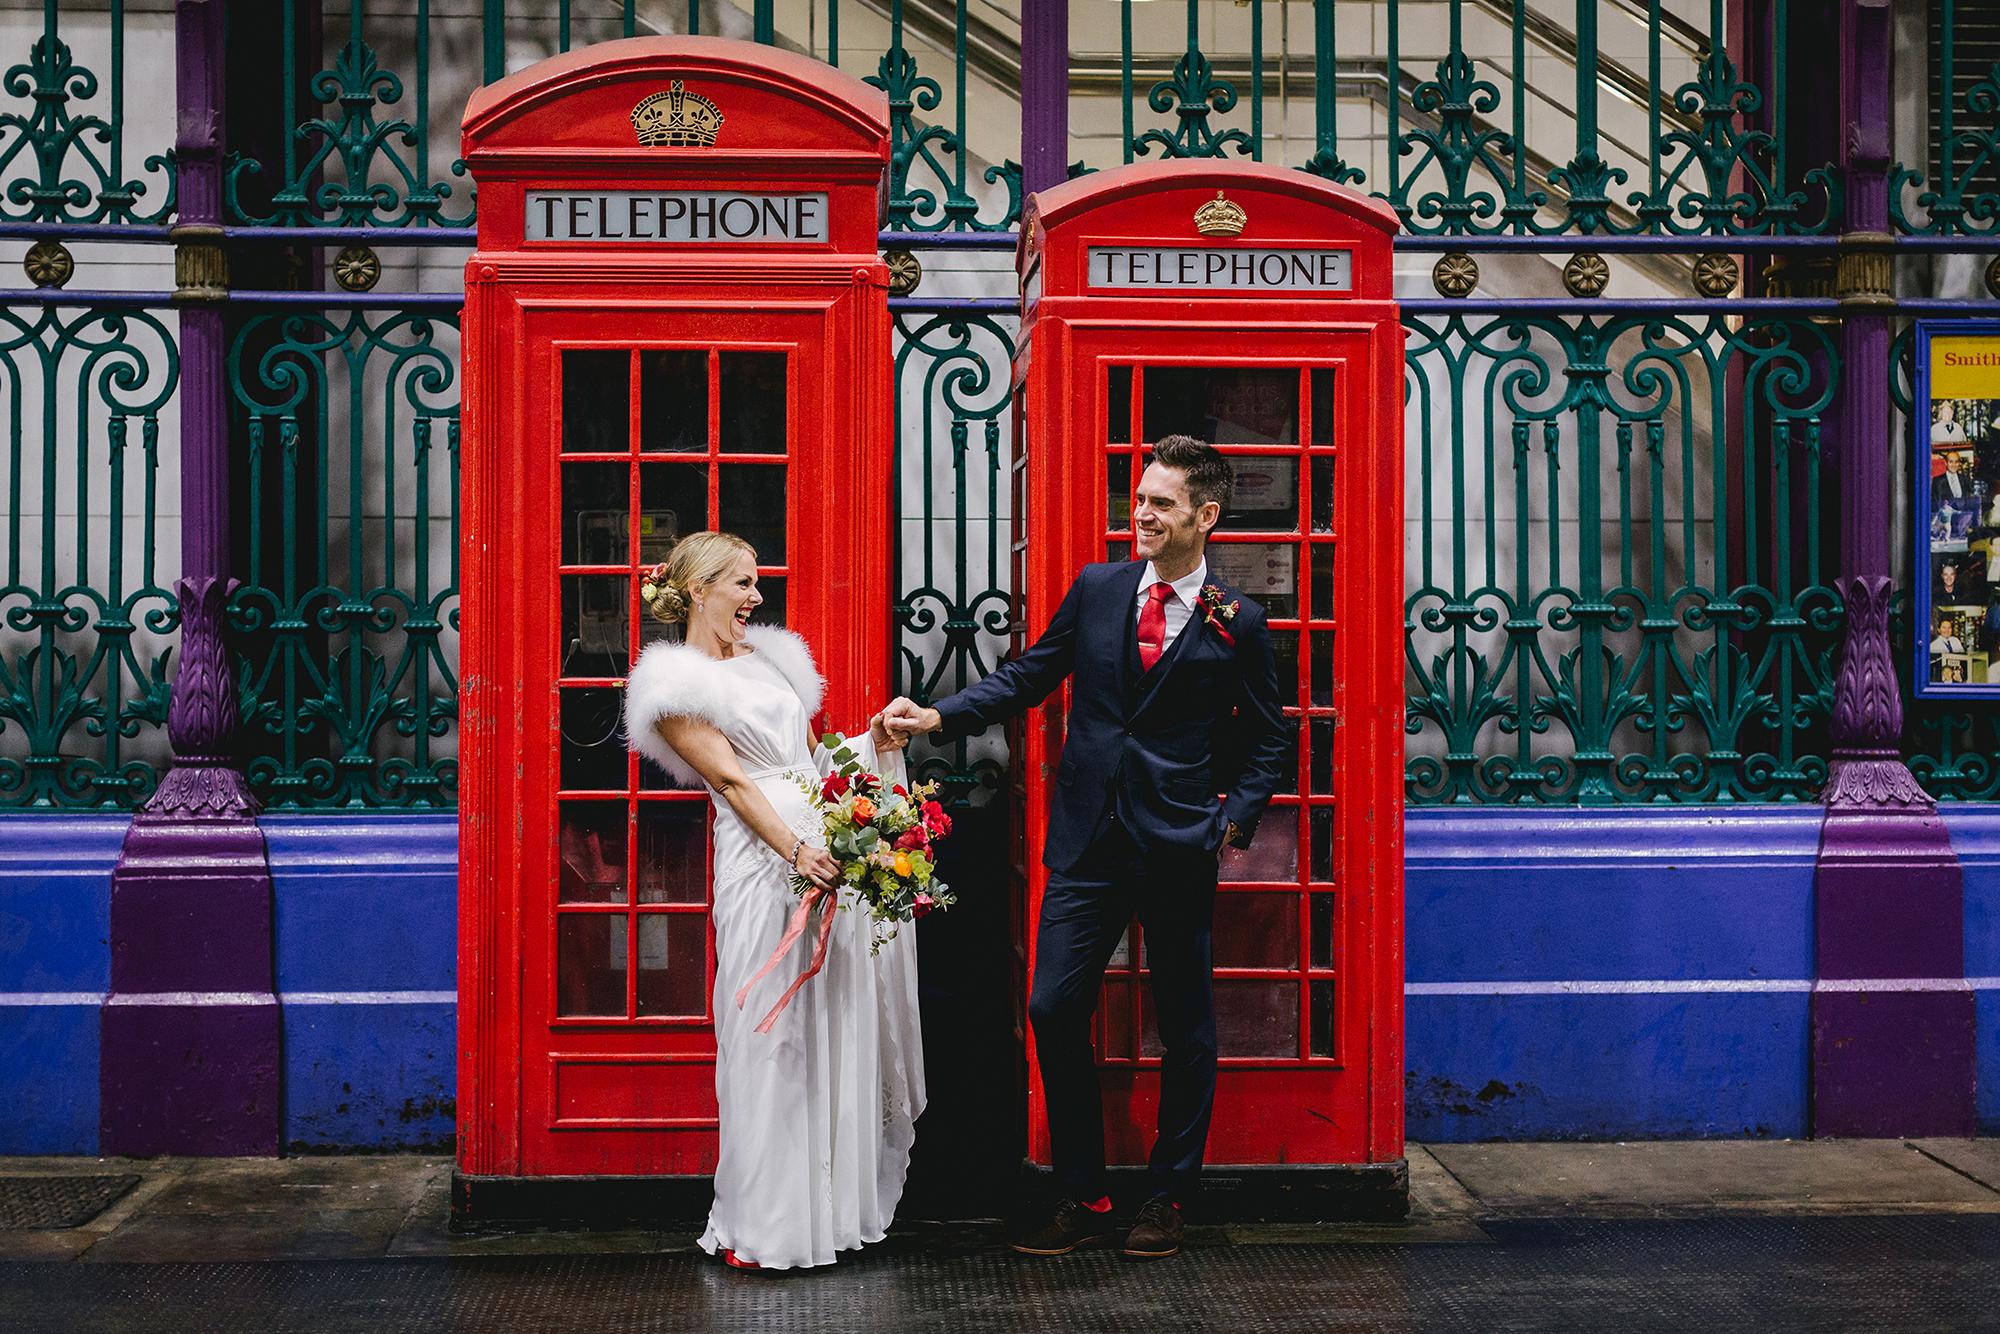 Anna Kara Glamour for an Elegant Winter Wedding | Love My